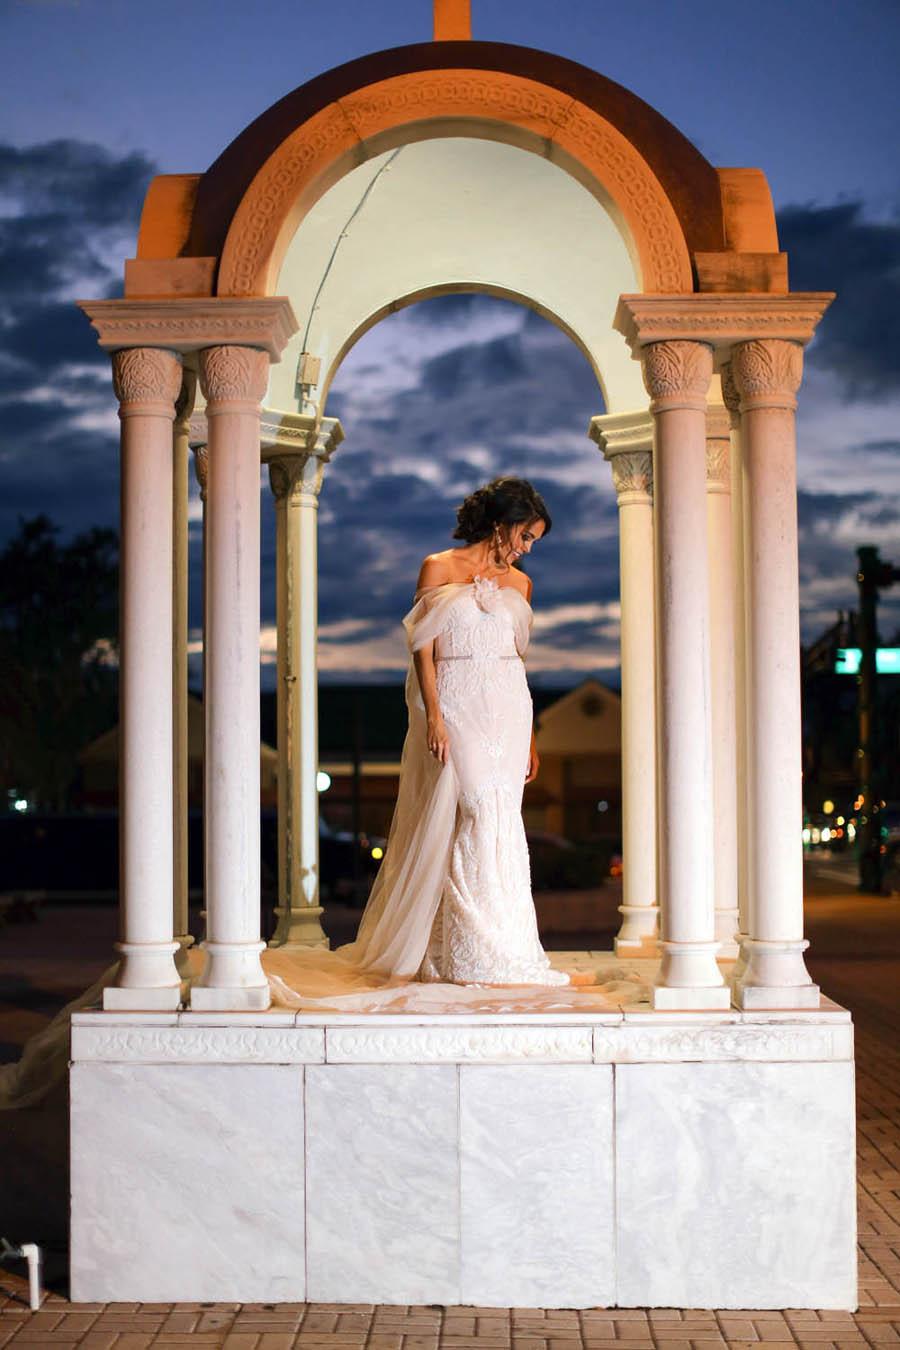 Outdoor Nighttime Greek Bridal Portrait with Columns in Inbal Dror Column Dress